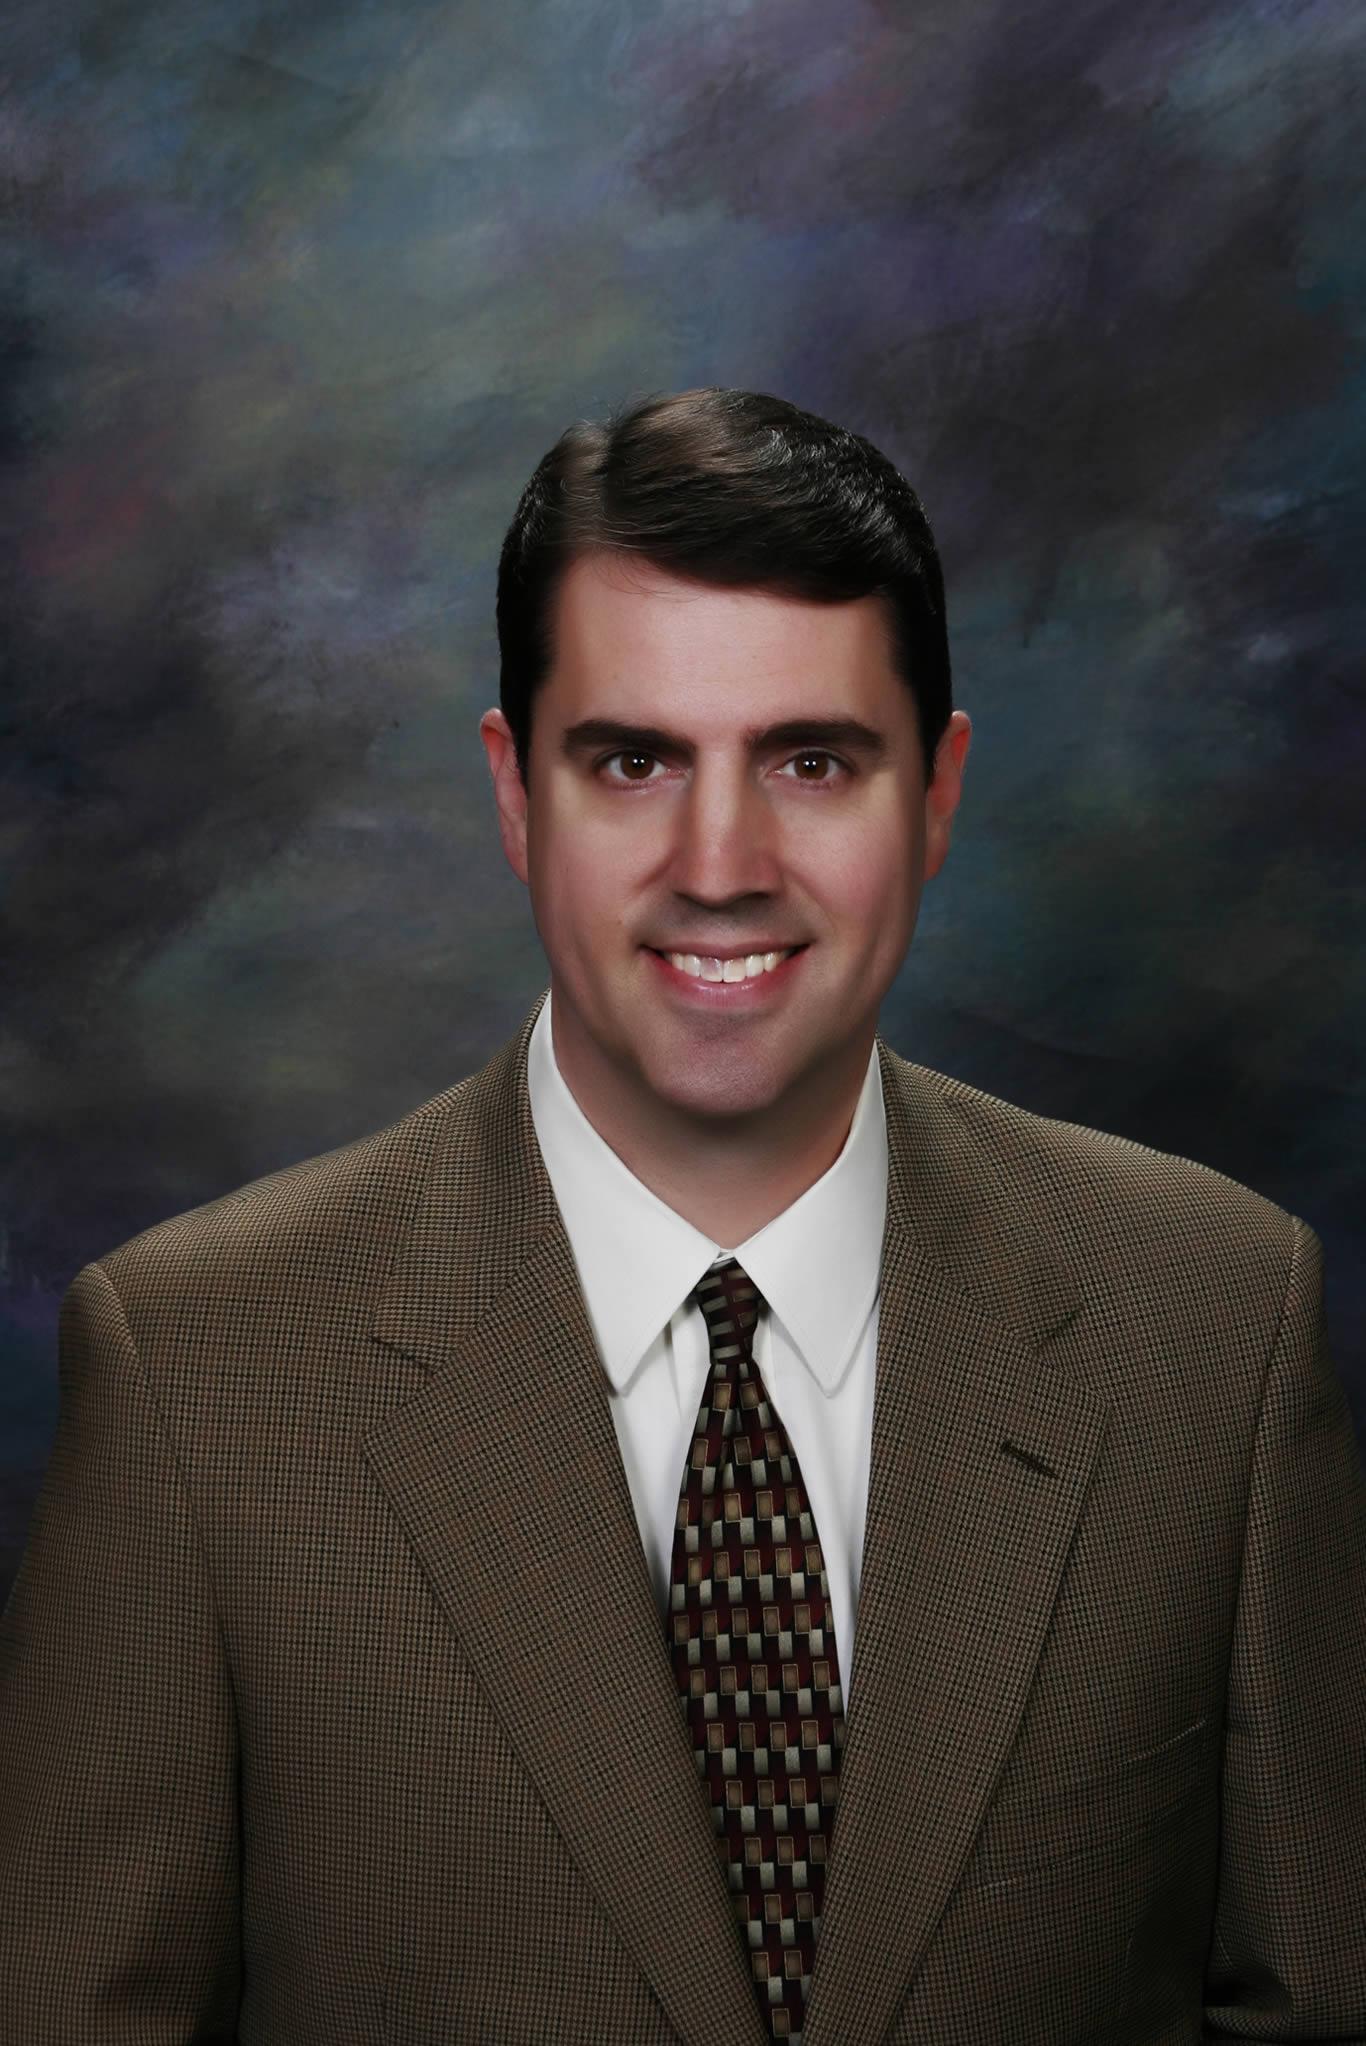 Judd L. McNaughton